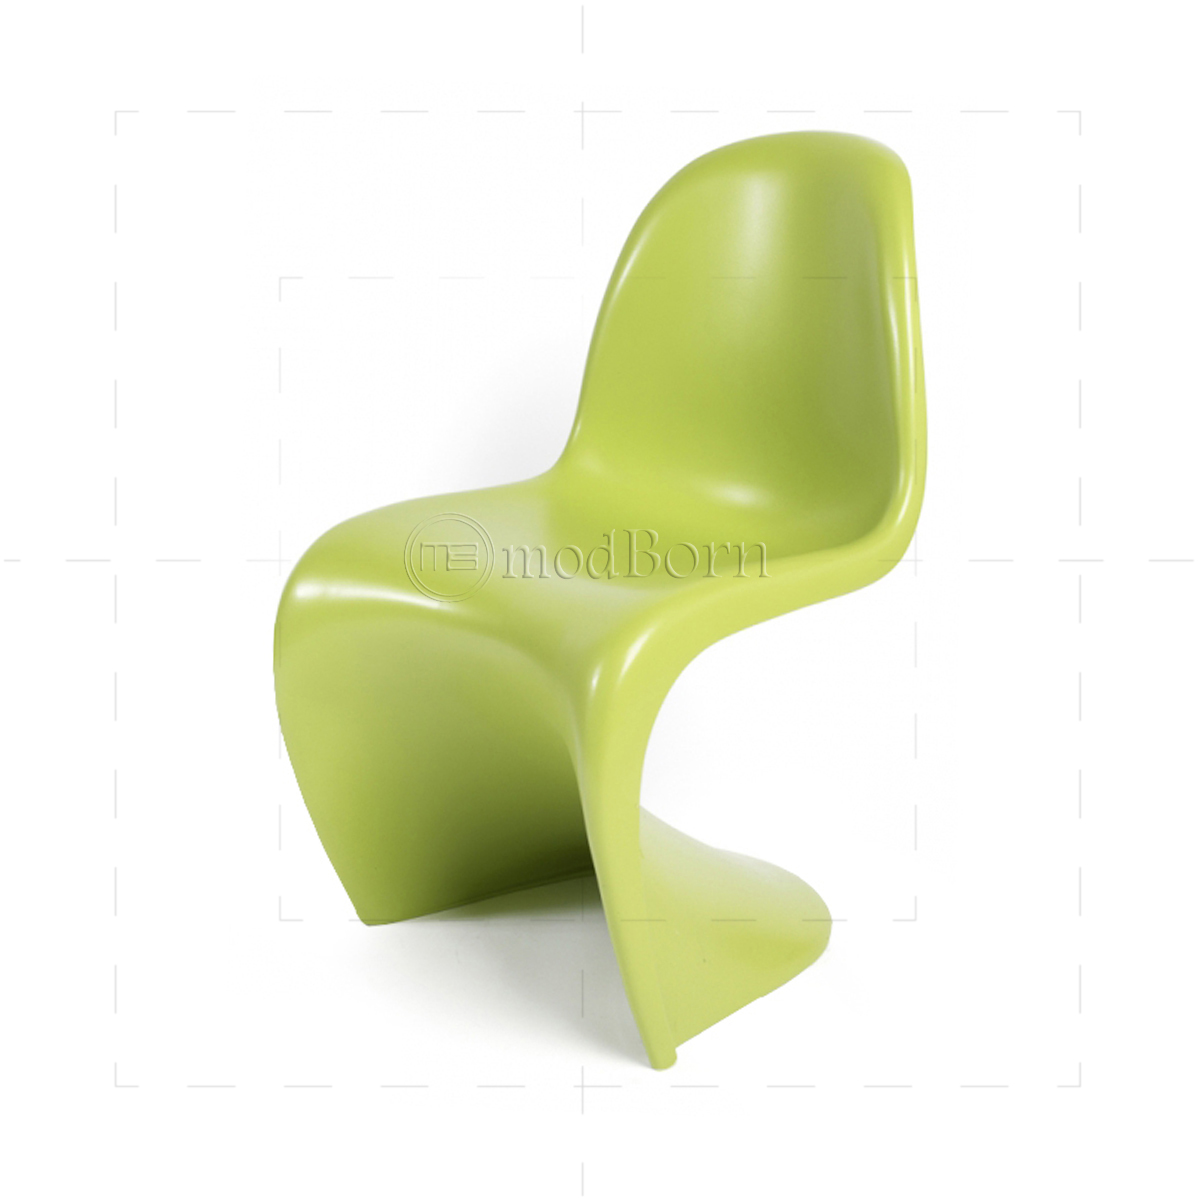 Verner panton chair green for Vitra replica deutschland